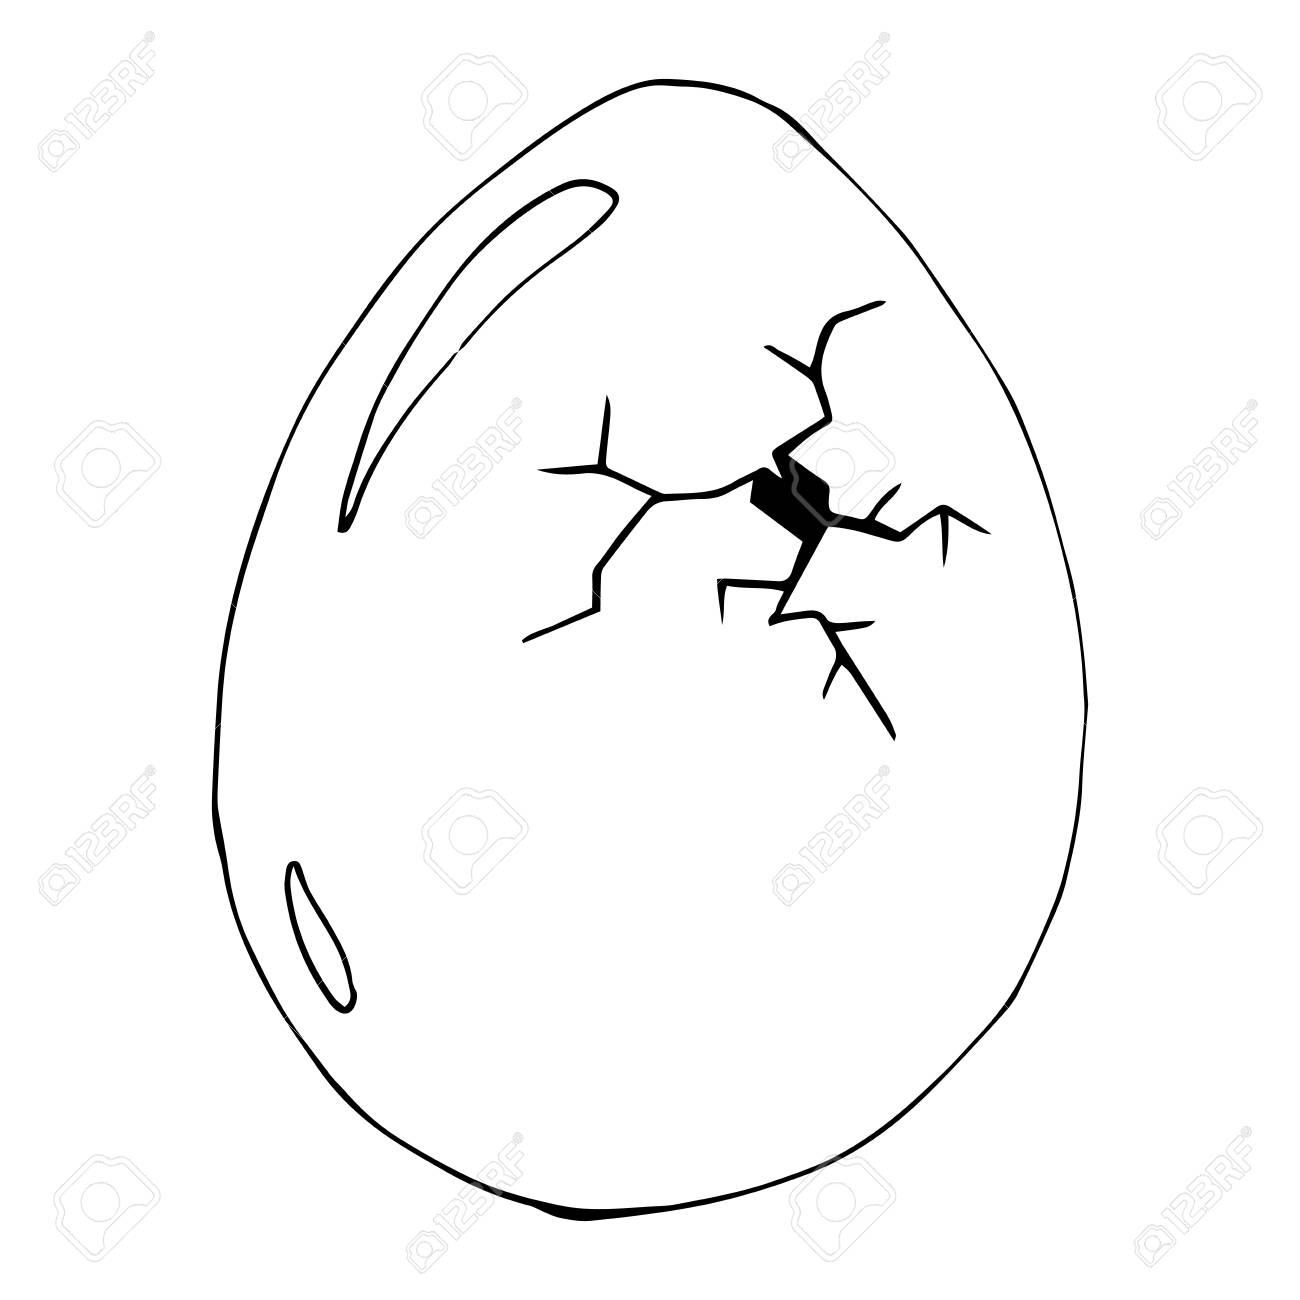 Cracked egg. Vector illustration of egg. Hand drawn cracked...